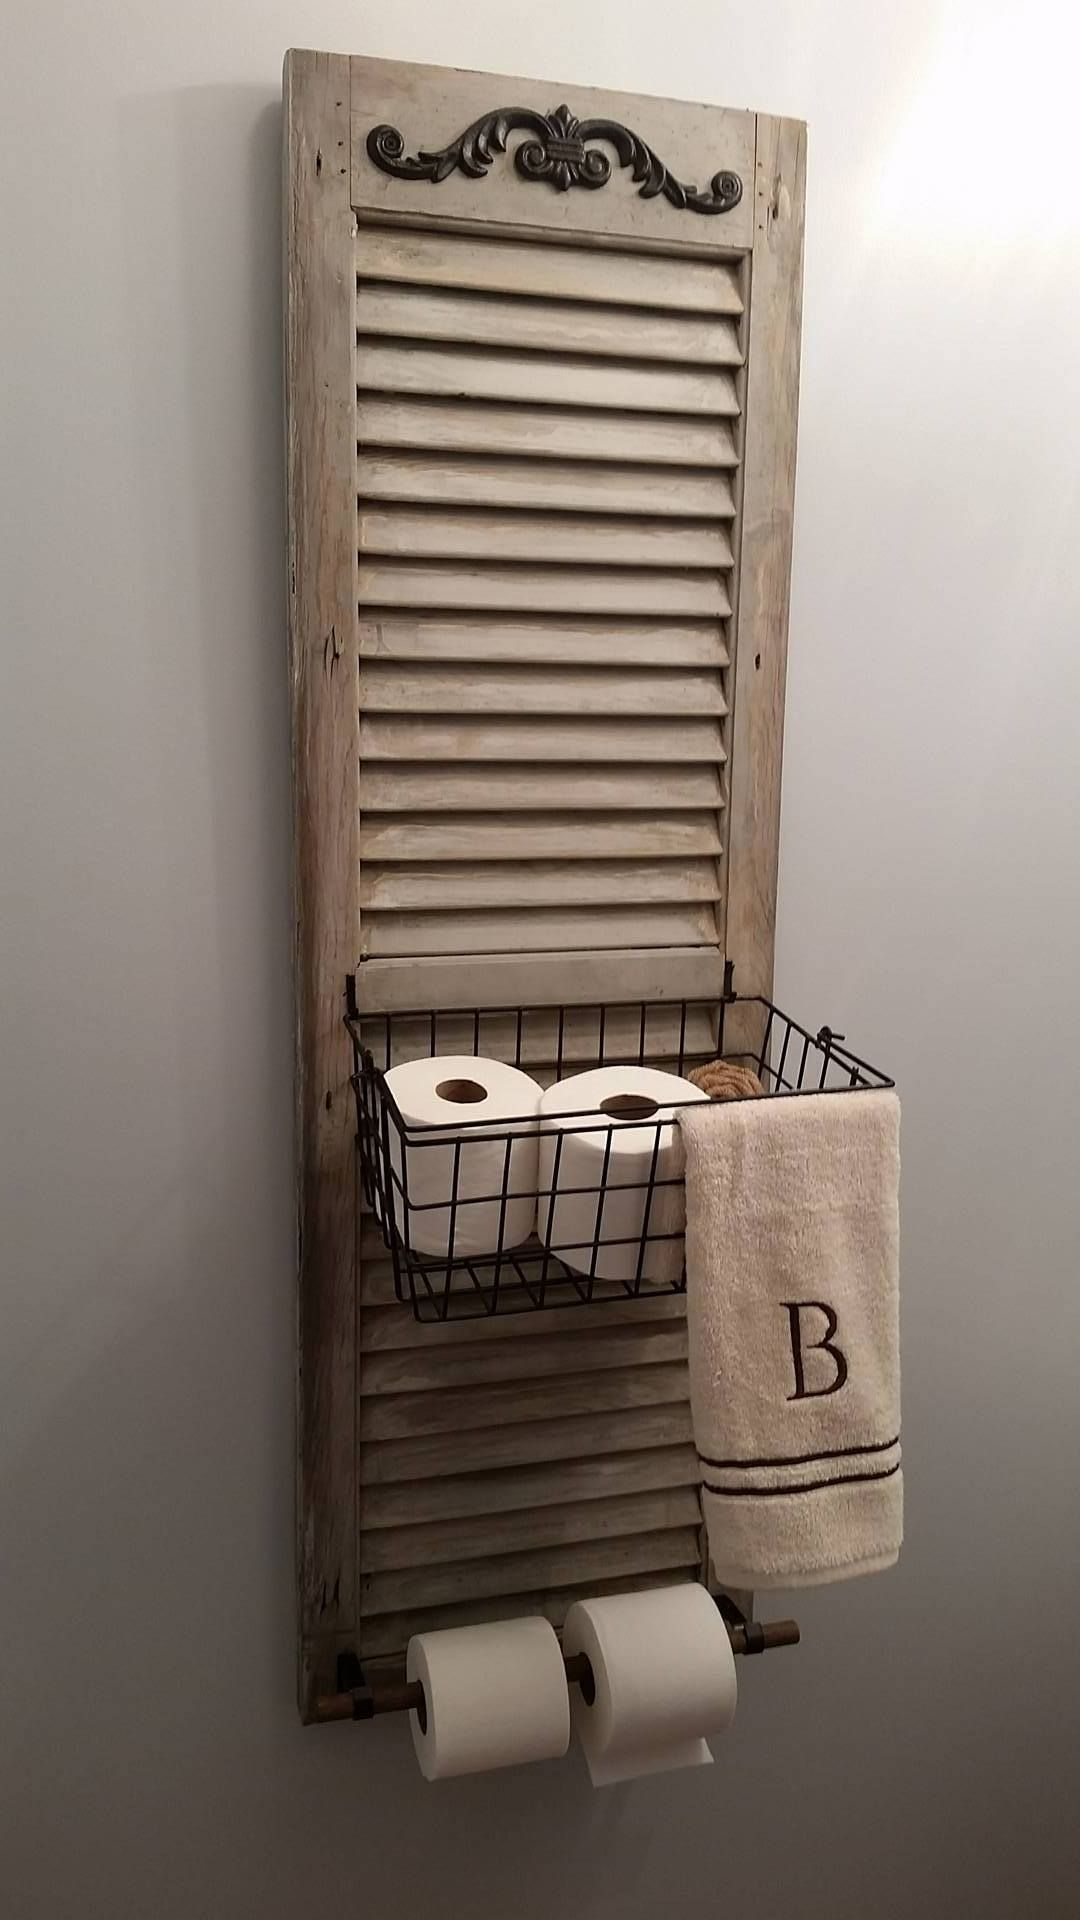 Camper Bathroom, Bathroom Caddy, Bathroom Organization, Small Bathroom, Bathroom  Ideas, Rustic Bathroom Decor, Shelves For Bathroom, Ideas For Bathrooms, ...